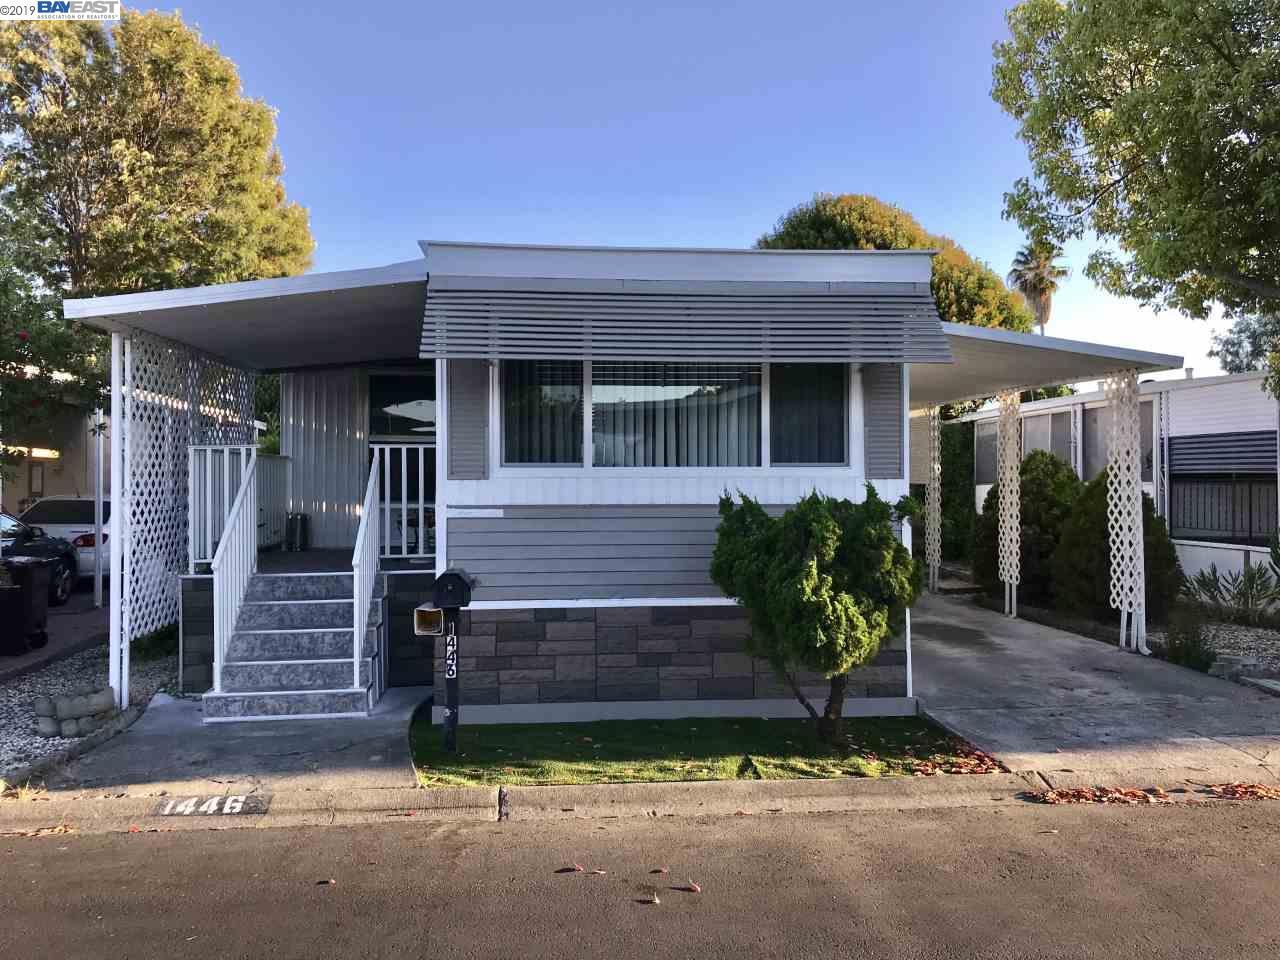 1446 Alcazar Ave Hayward, CA 94544